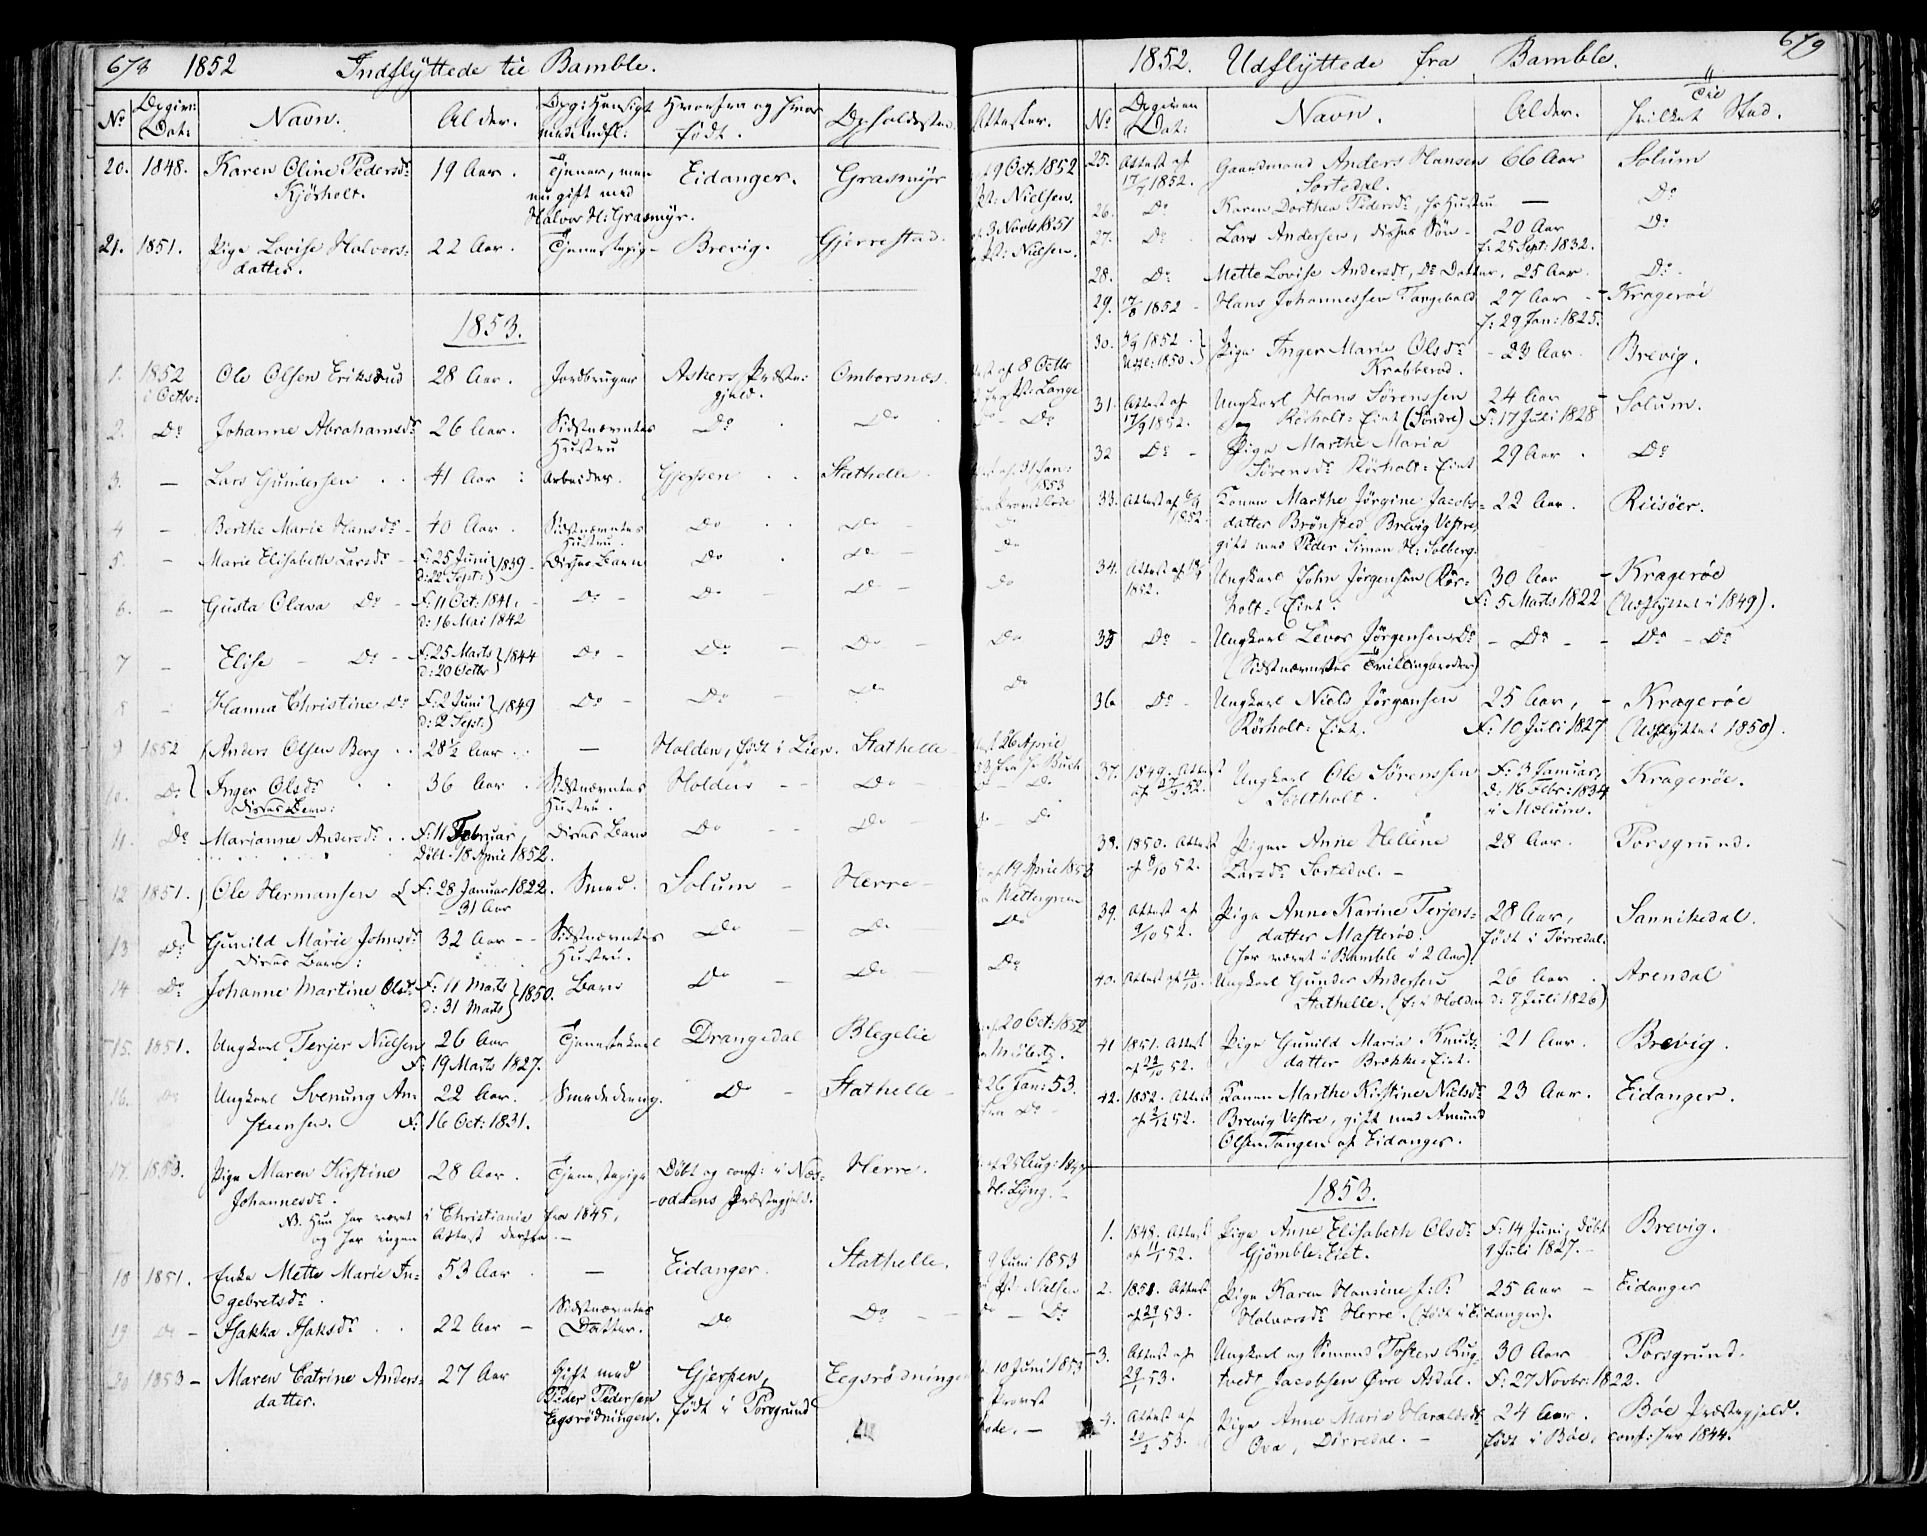 SAKO, Bamble kirkebøker, F/Fa/L0004: Ministerialbok nr. I 4, 1834-1853, s. 678-679